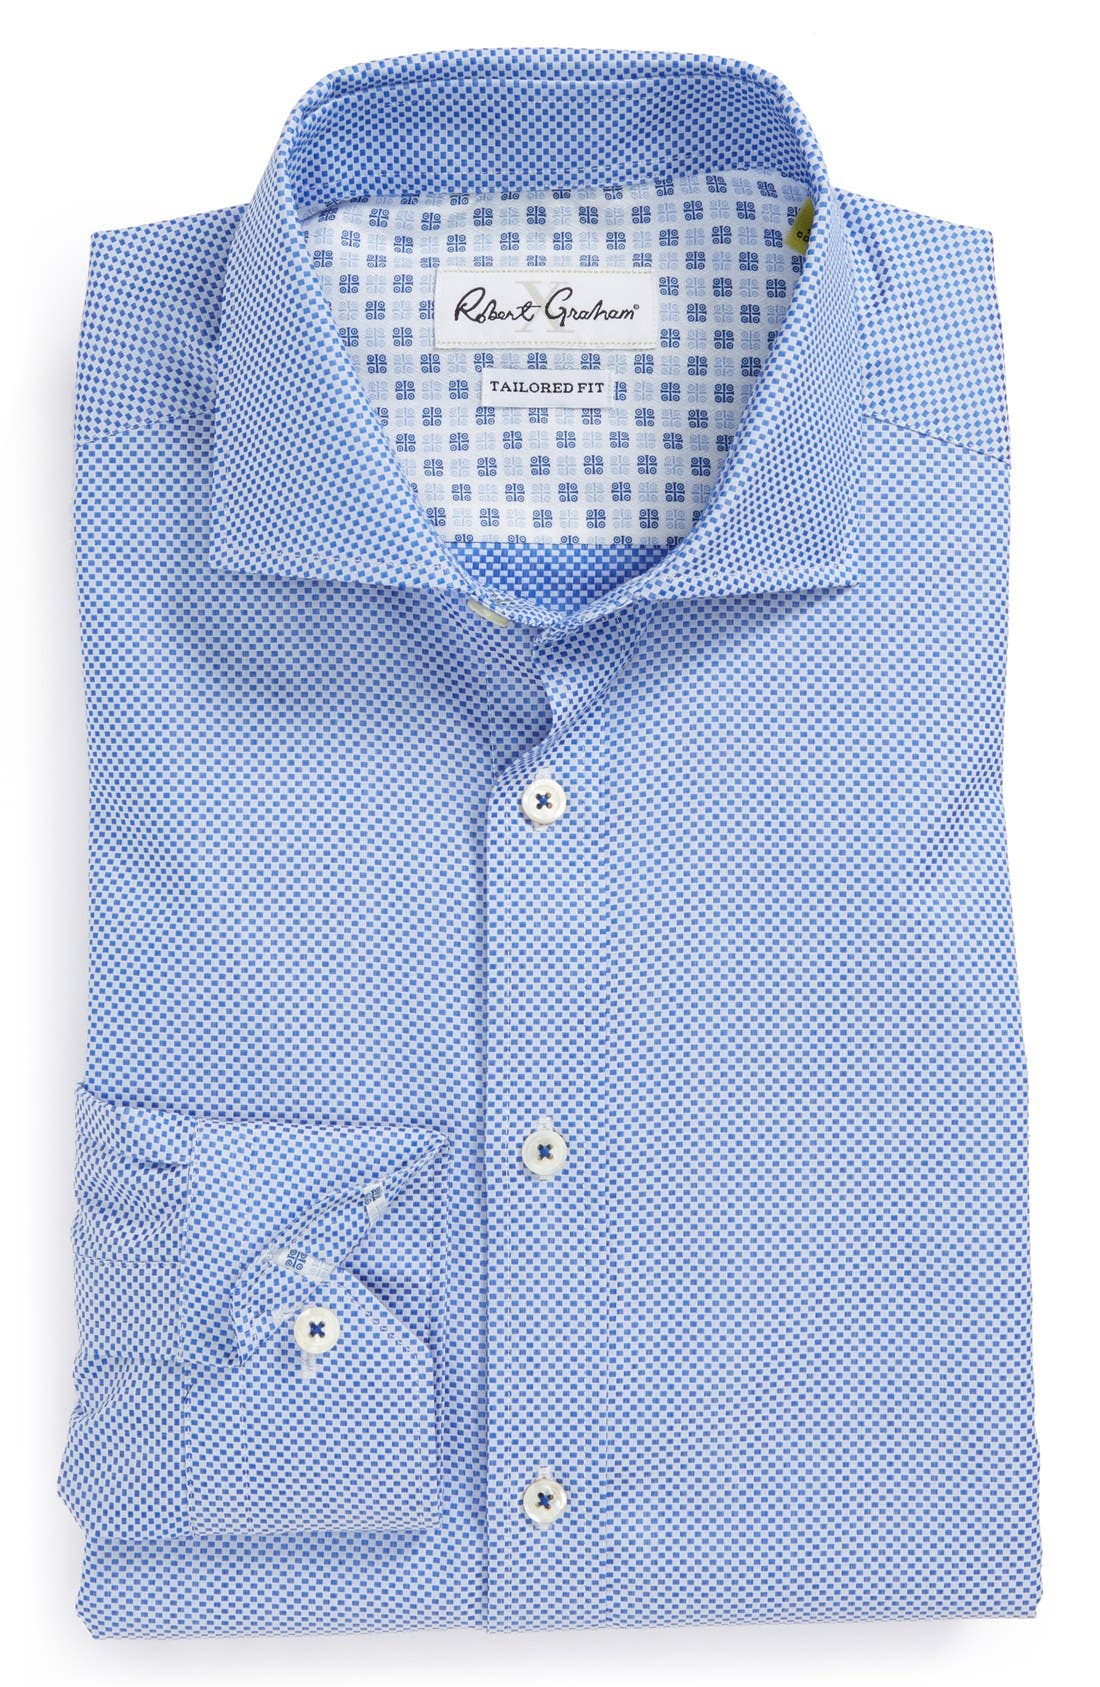 Main Image - Robert Graham 'Bologna' Tailored Fit Dot Dress Shirt